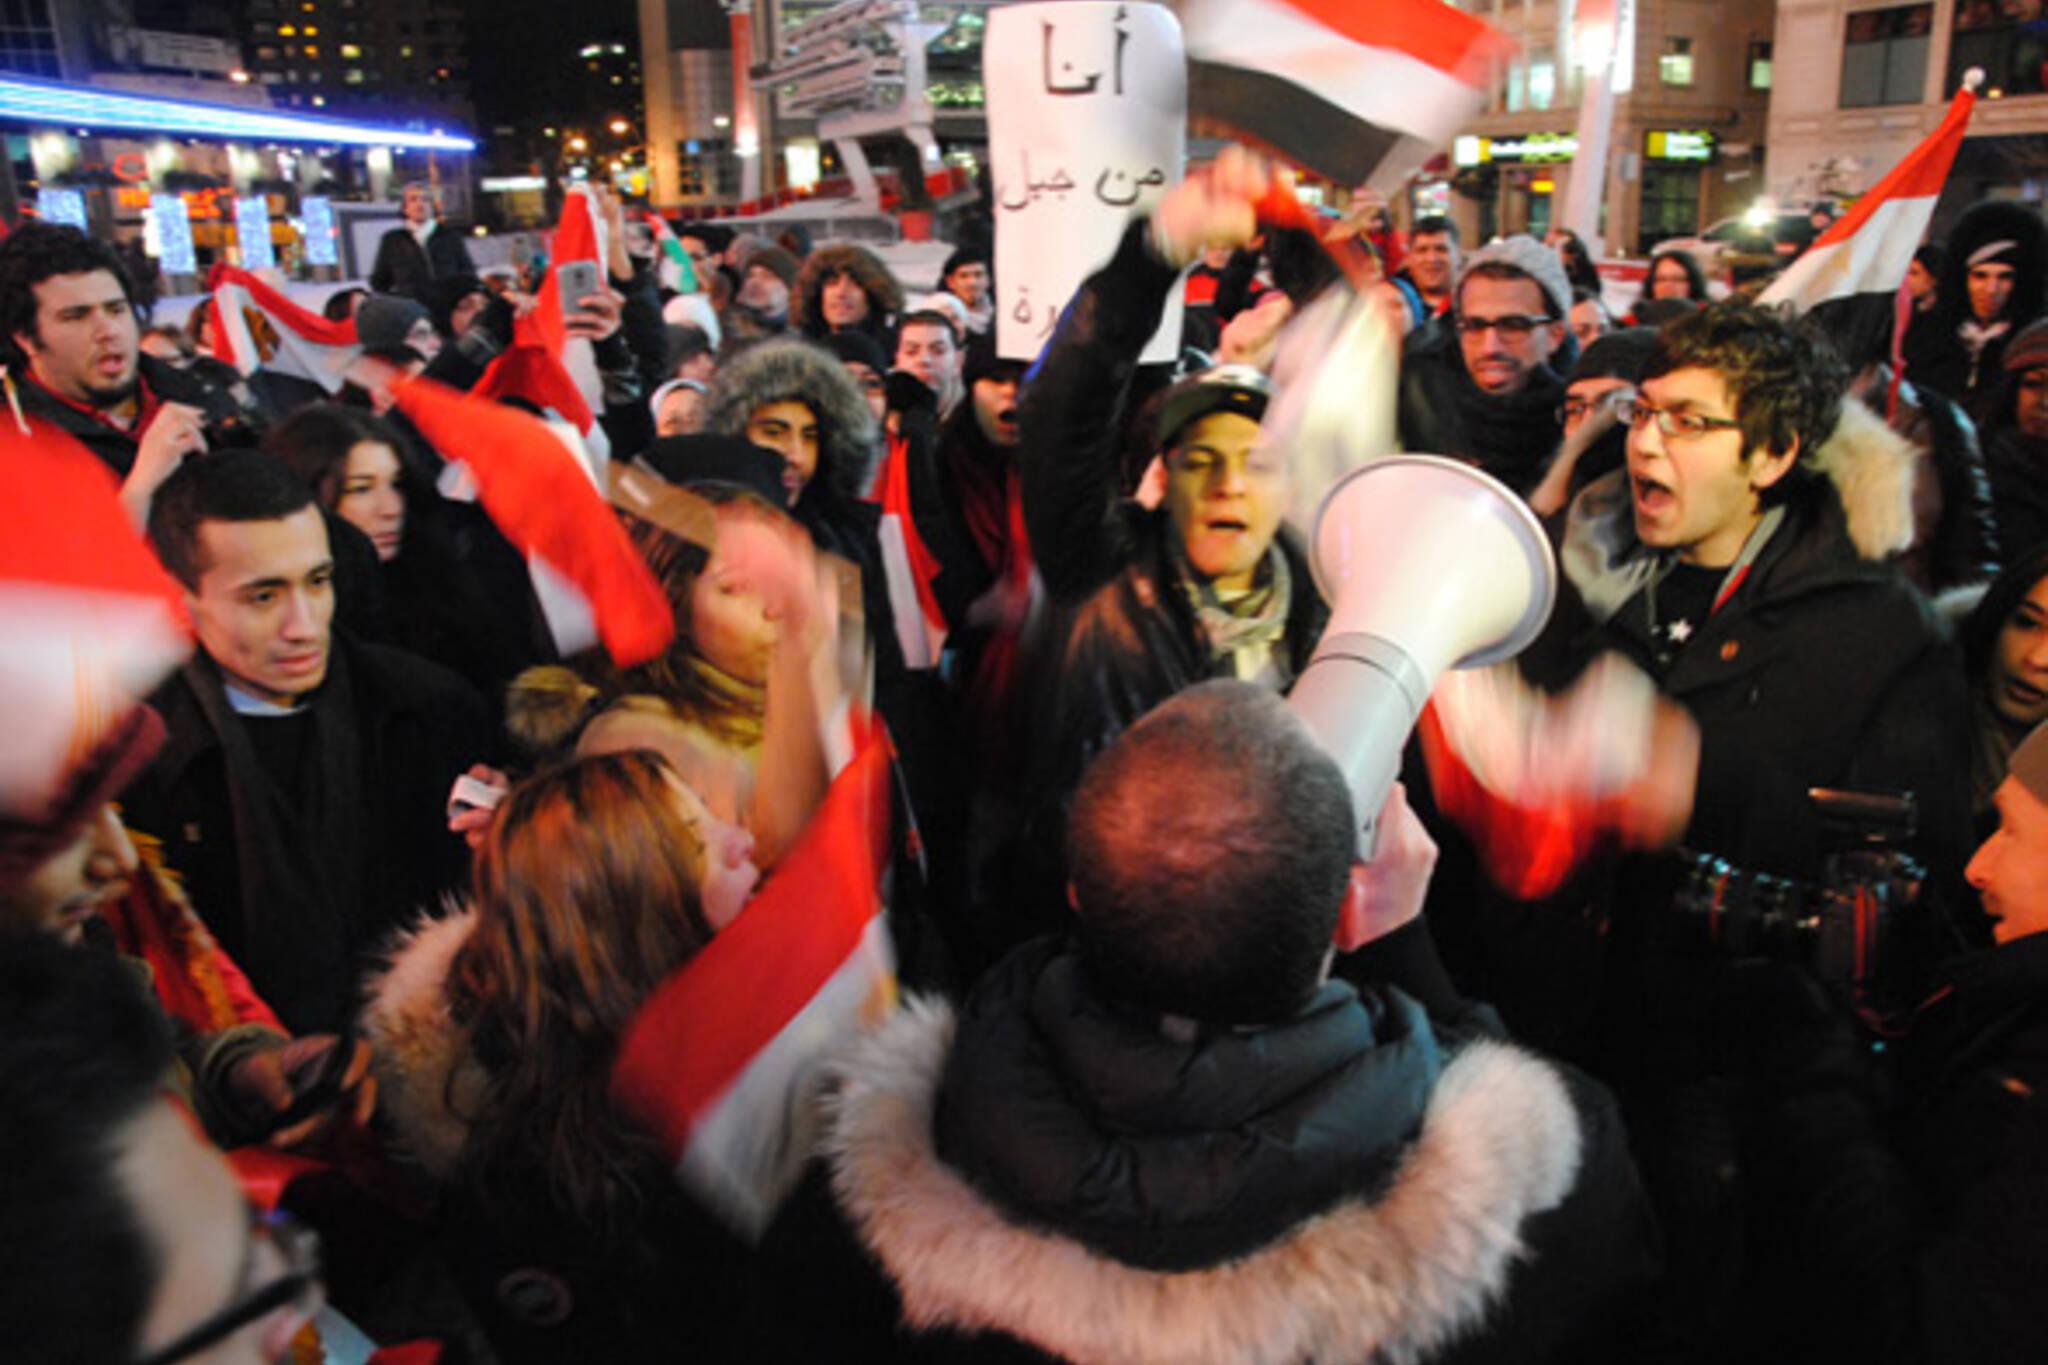 Toronto Egypt Celebrate Mubarak Yonge Dundas